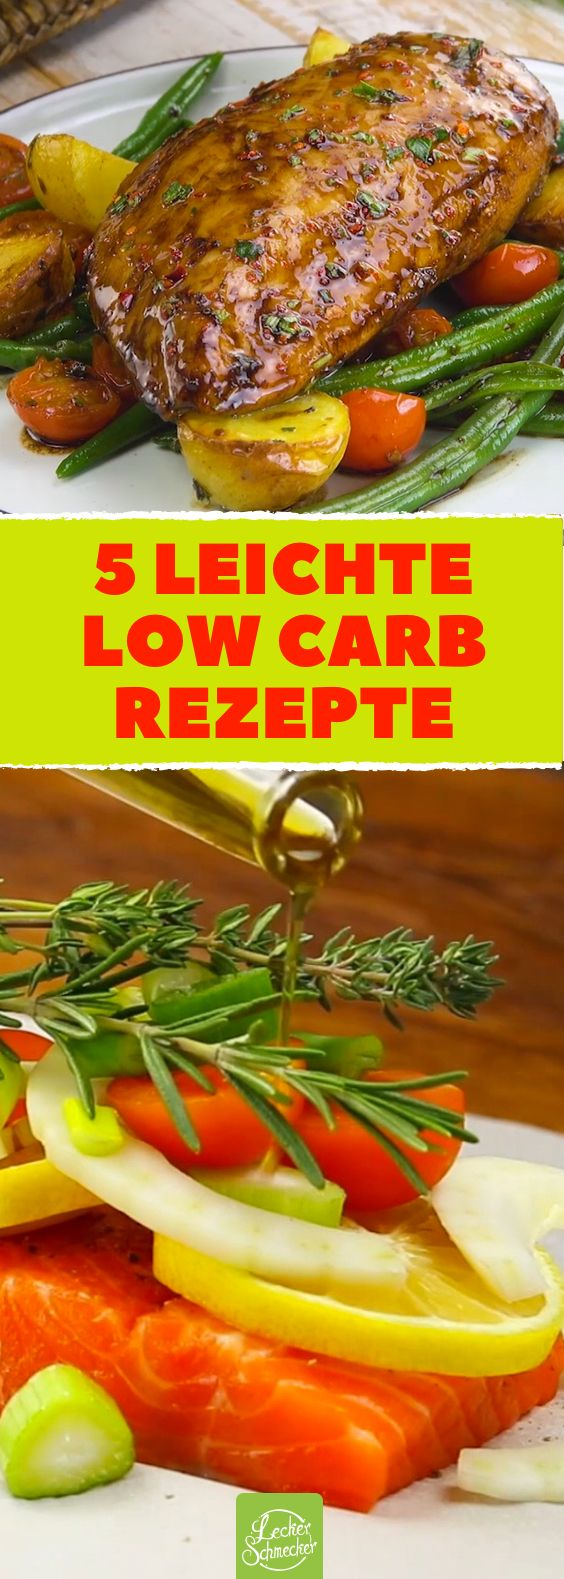 5 schmackhafte Rezepte, die wenig Kohlenhydrate haben, super! #rezept #rezepte #lowcarb #kohlenhydratarm #lachs #hühnchen #zucchini #olivenöl #nocarbdiets